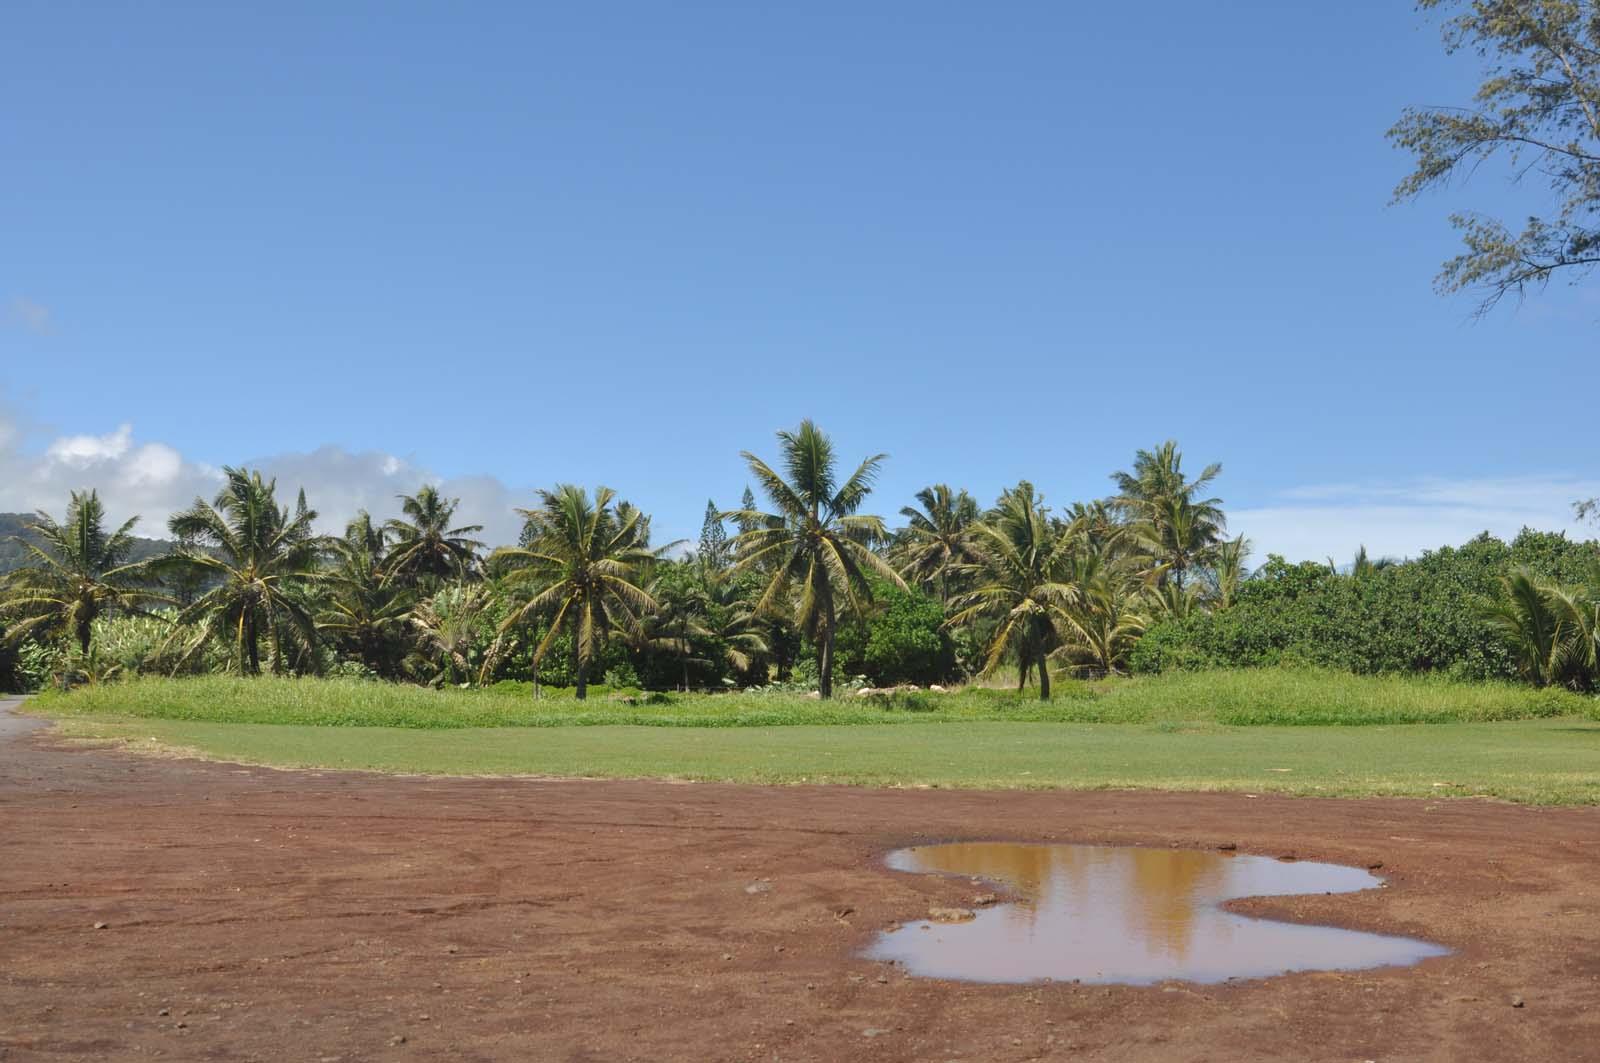 134_maui_hawaii_island